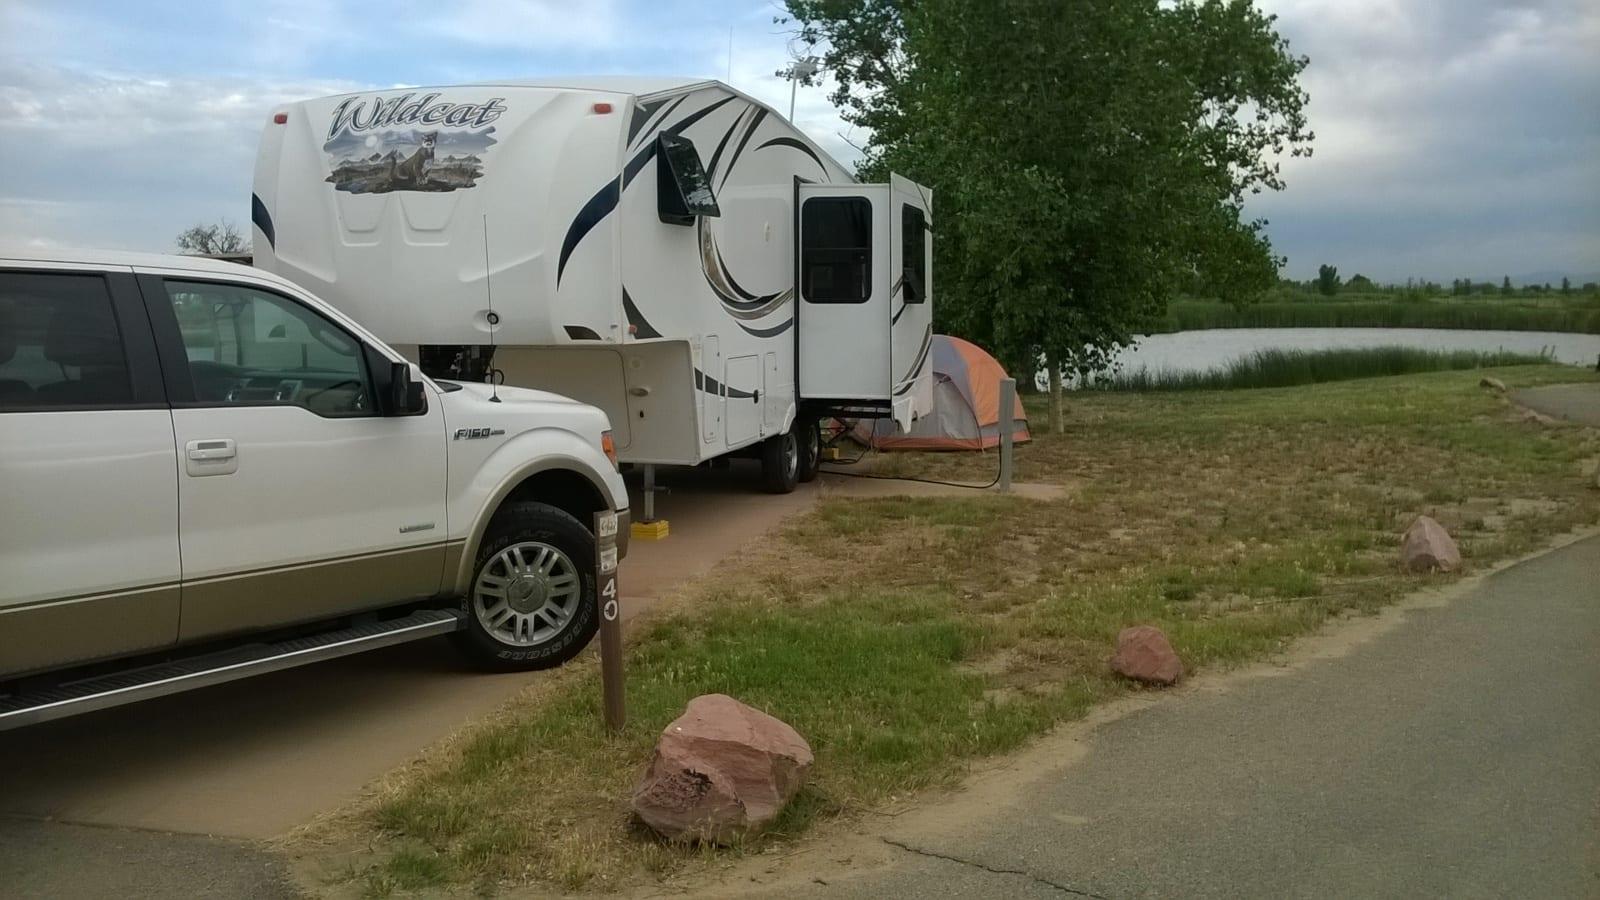 St Vrain State Park Firestone CO RV Campground